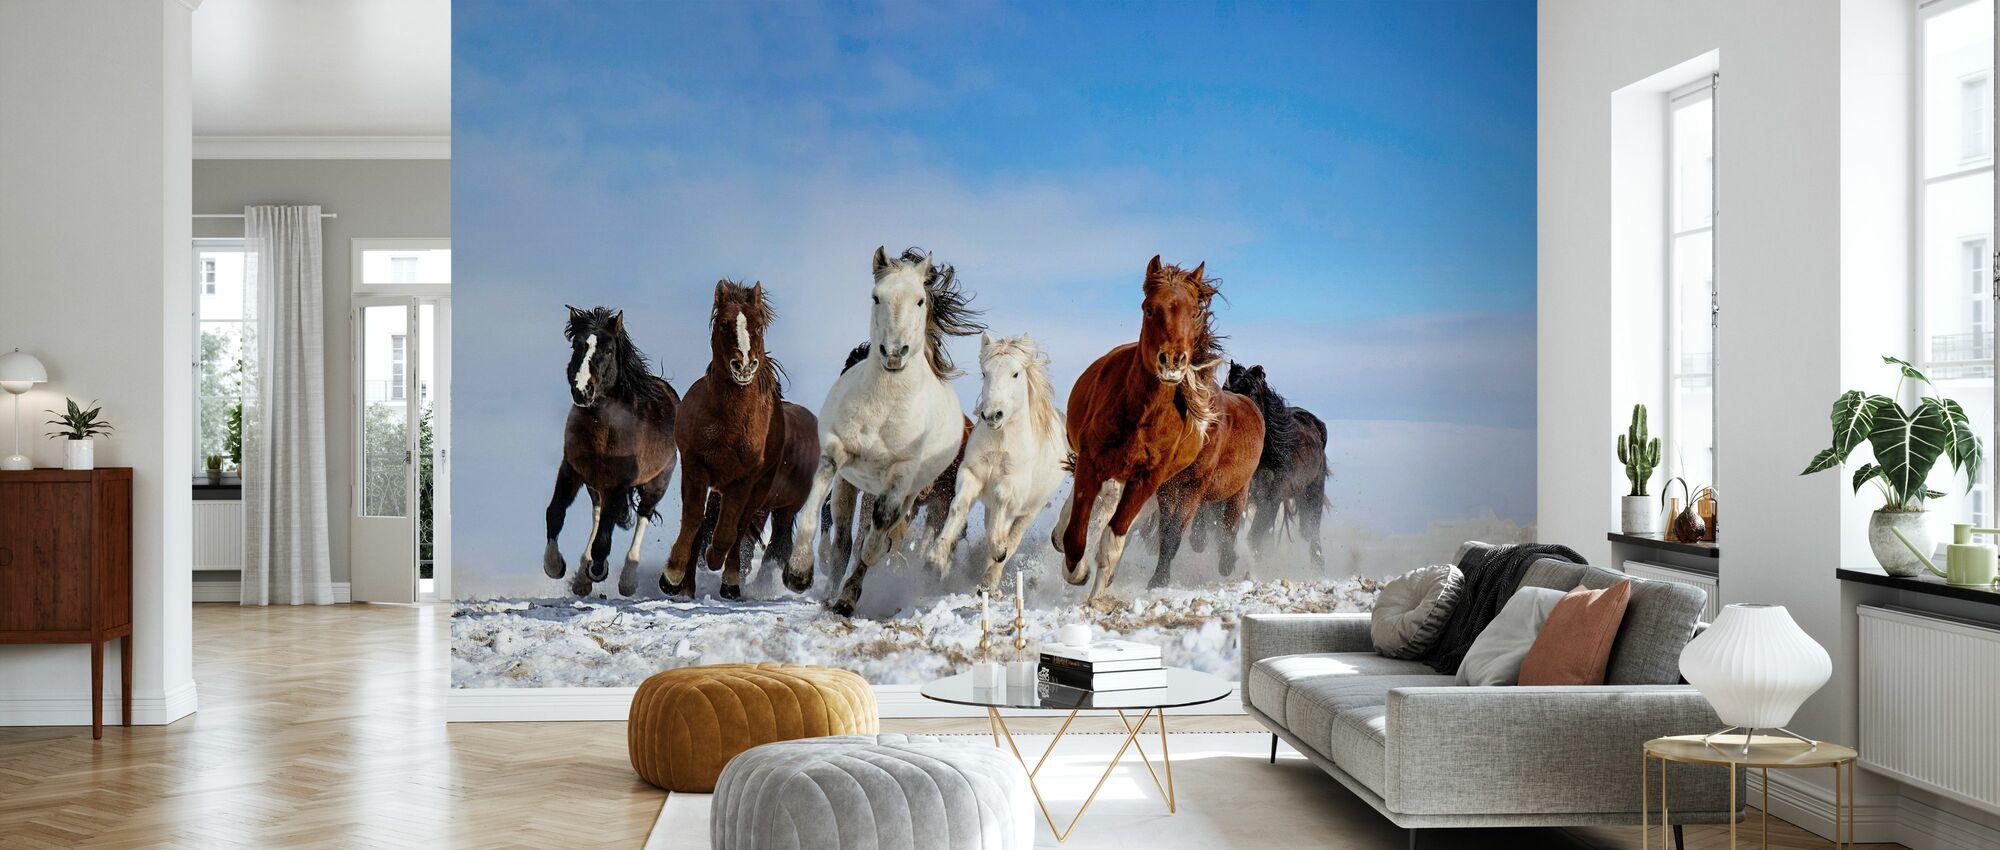 Mongolia Horses - Wallpaper - Living Room